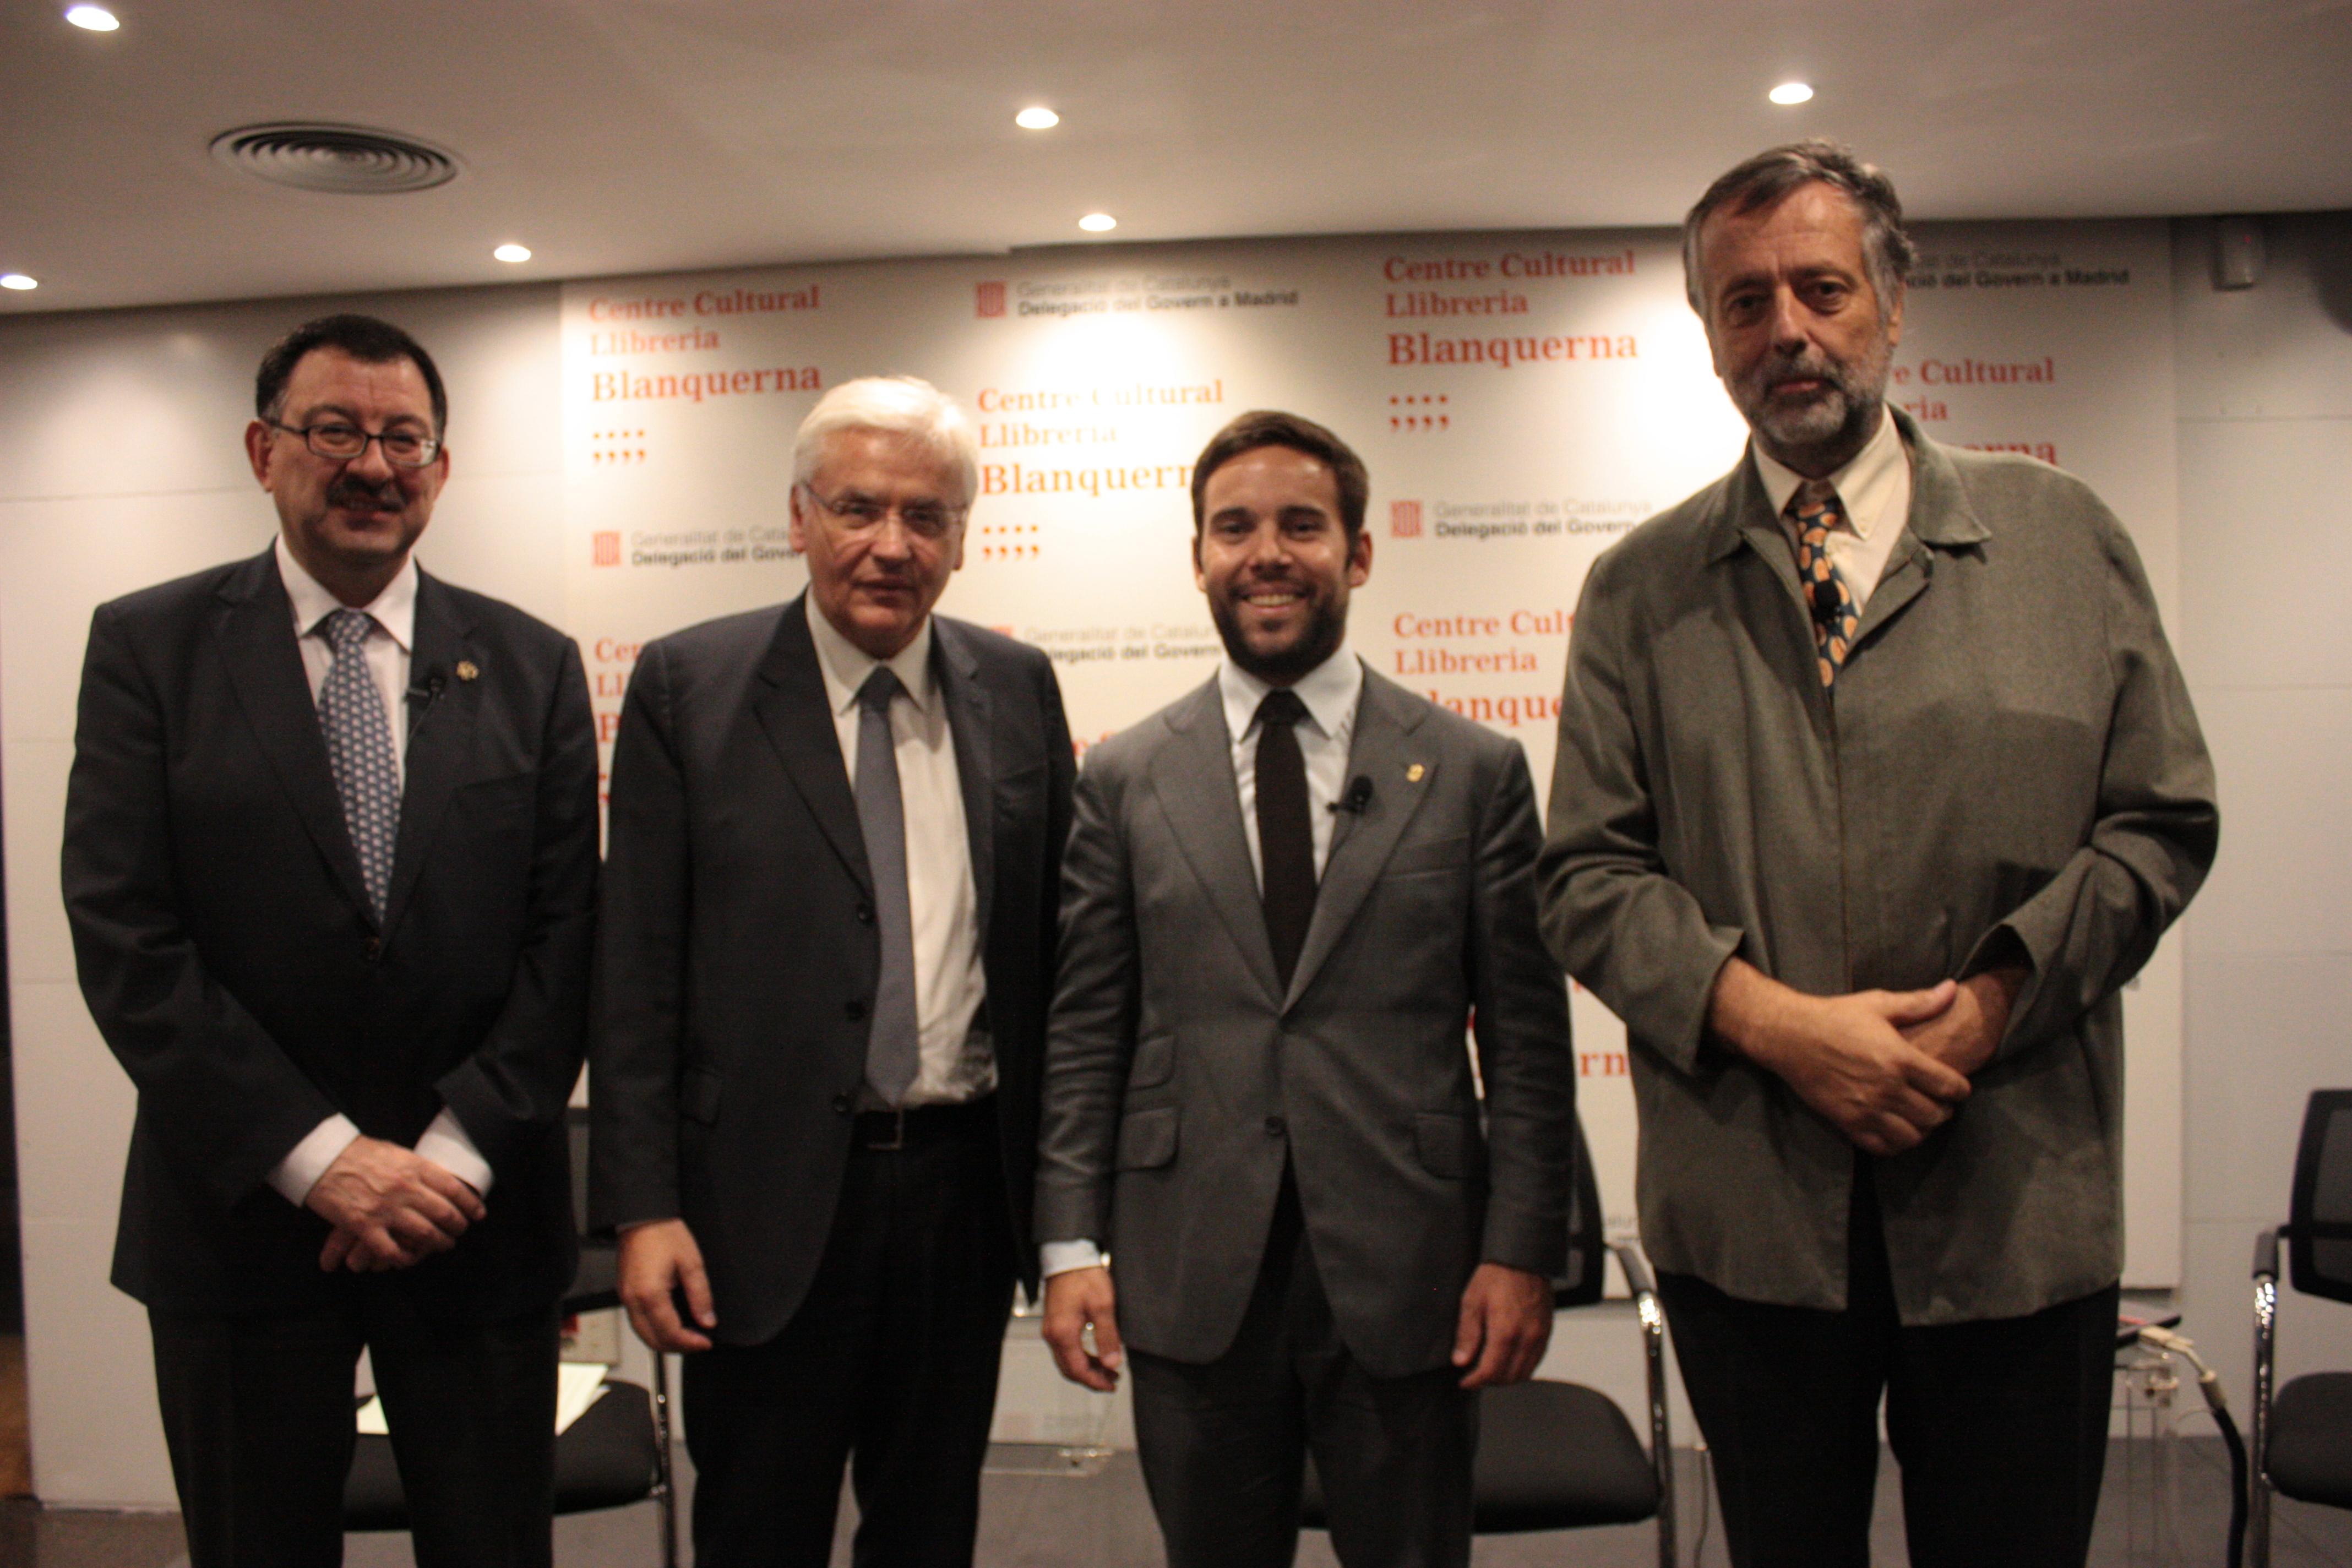 Presentacion Der IEA-AALO En Centre Culturau Blanquerna, Delegacion  Deth Govèrn Dera Generalitat En Madrid